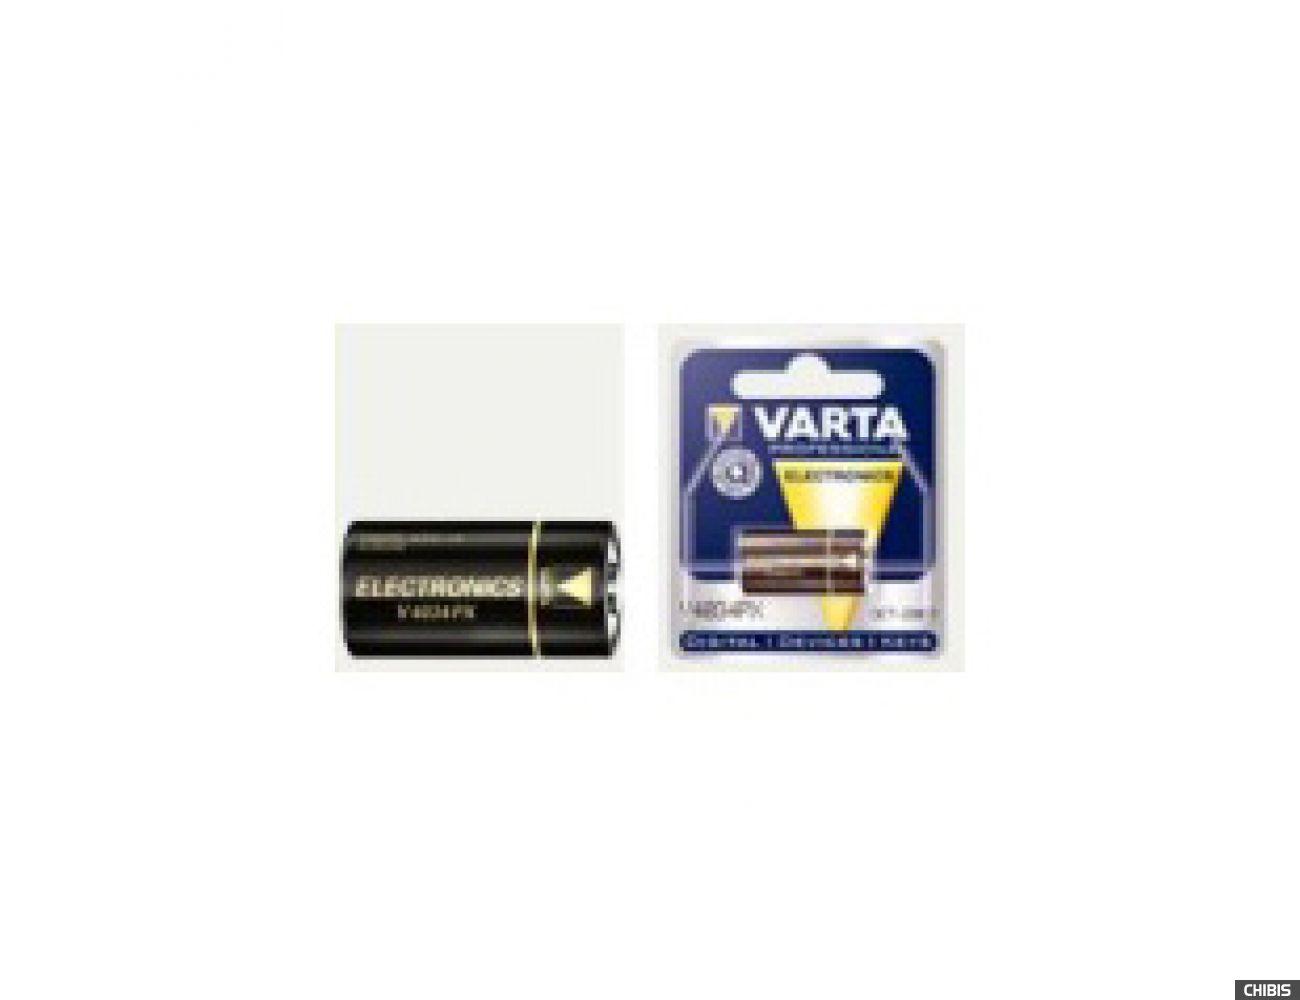 Батарейка Varta V4034PX Professional Electronics (4LR44, 100mAh, 6V, Alkaline Щелочная) 04034101401